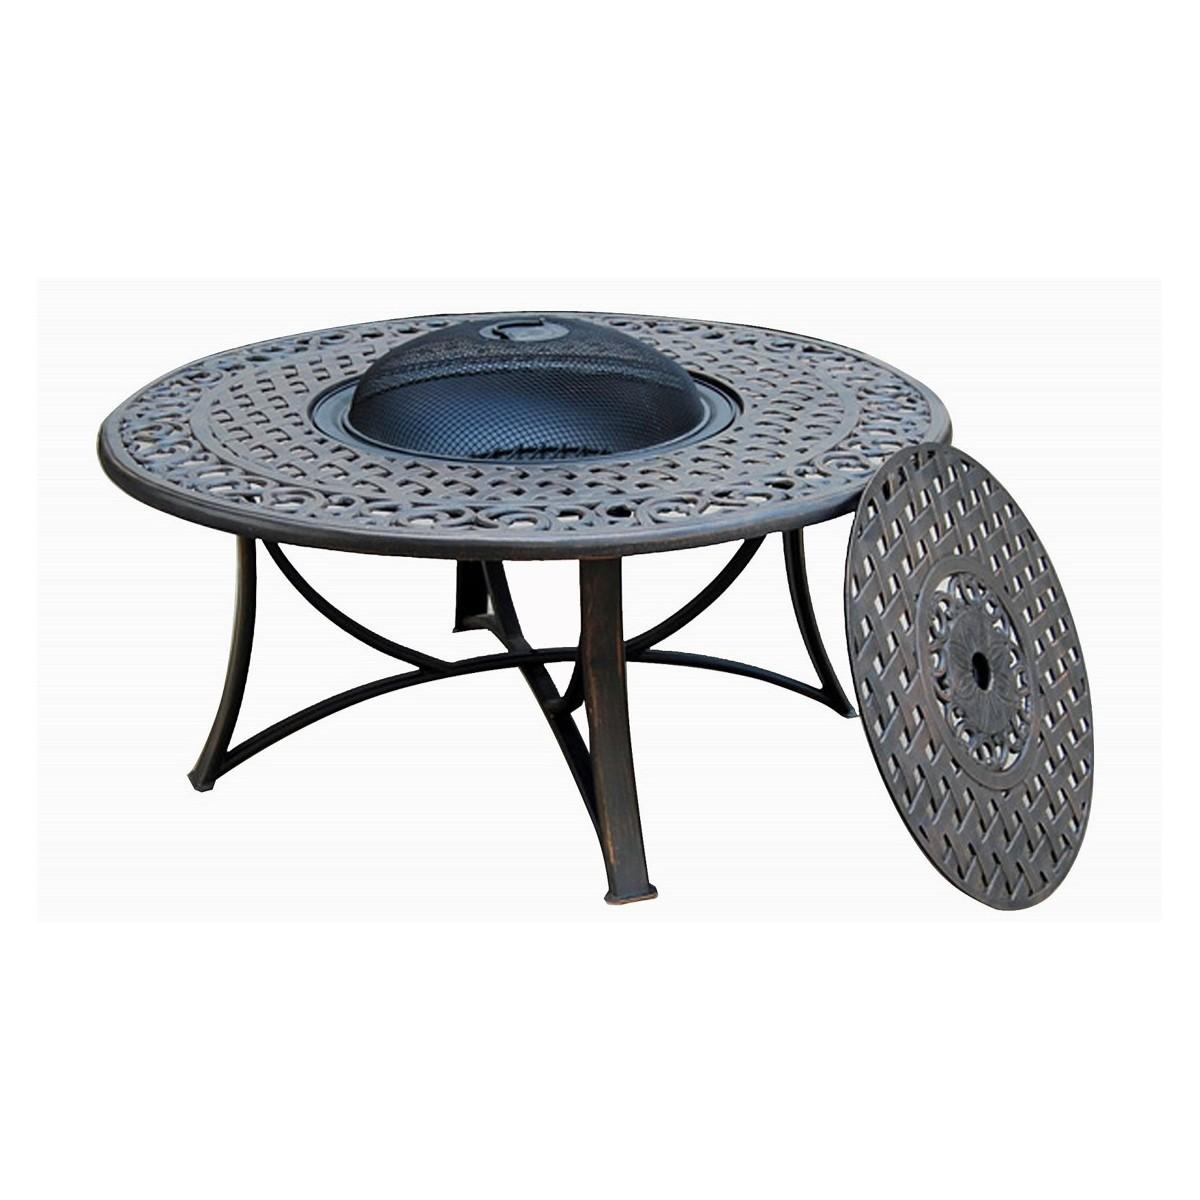 table de jardin basse ronde moorea aspect fer forge noir amp story 4089